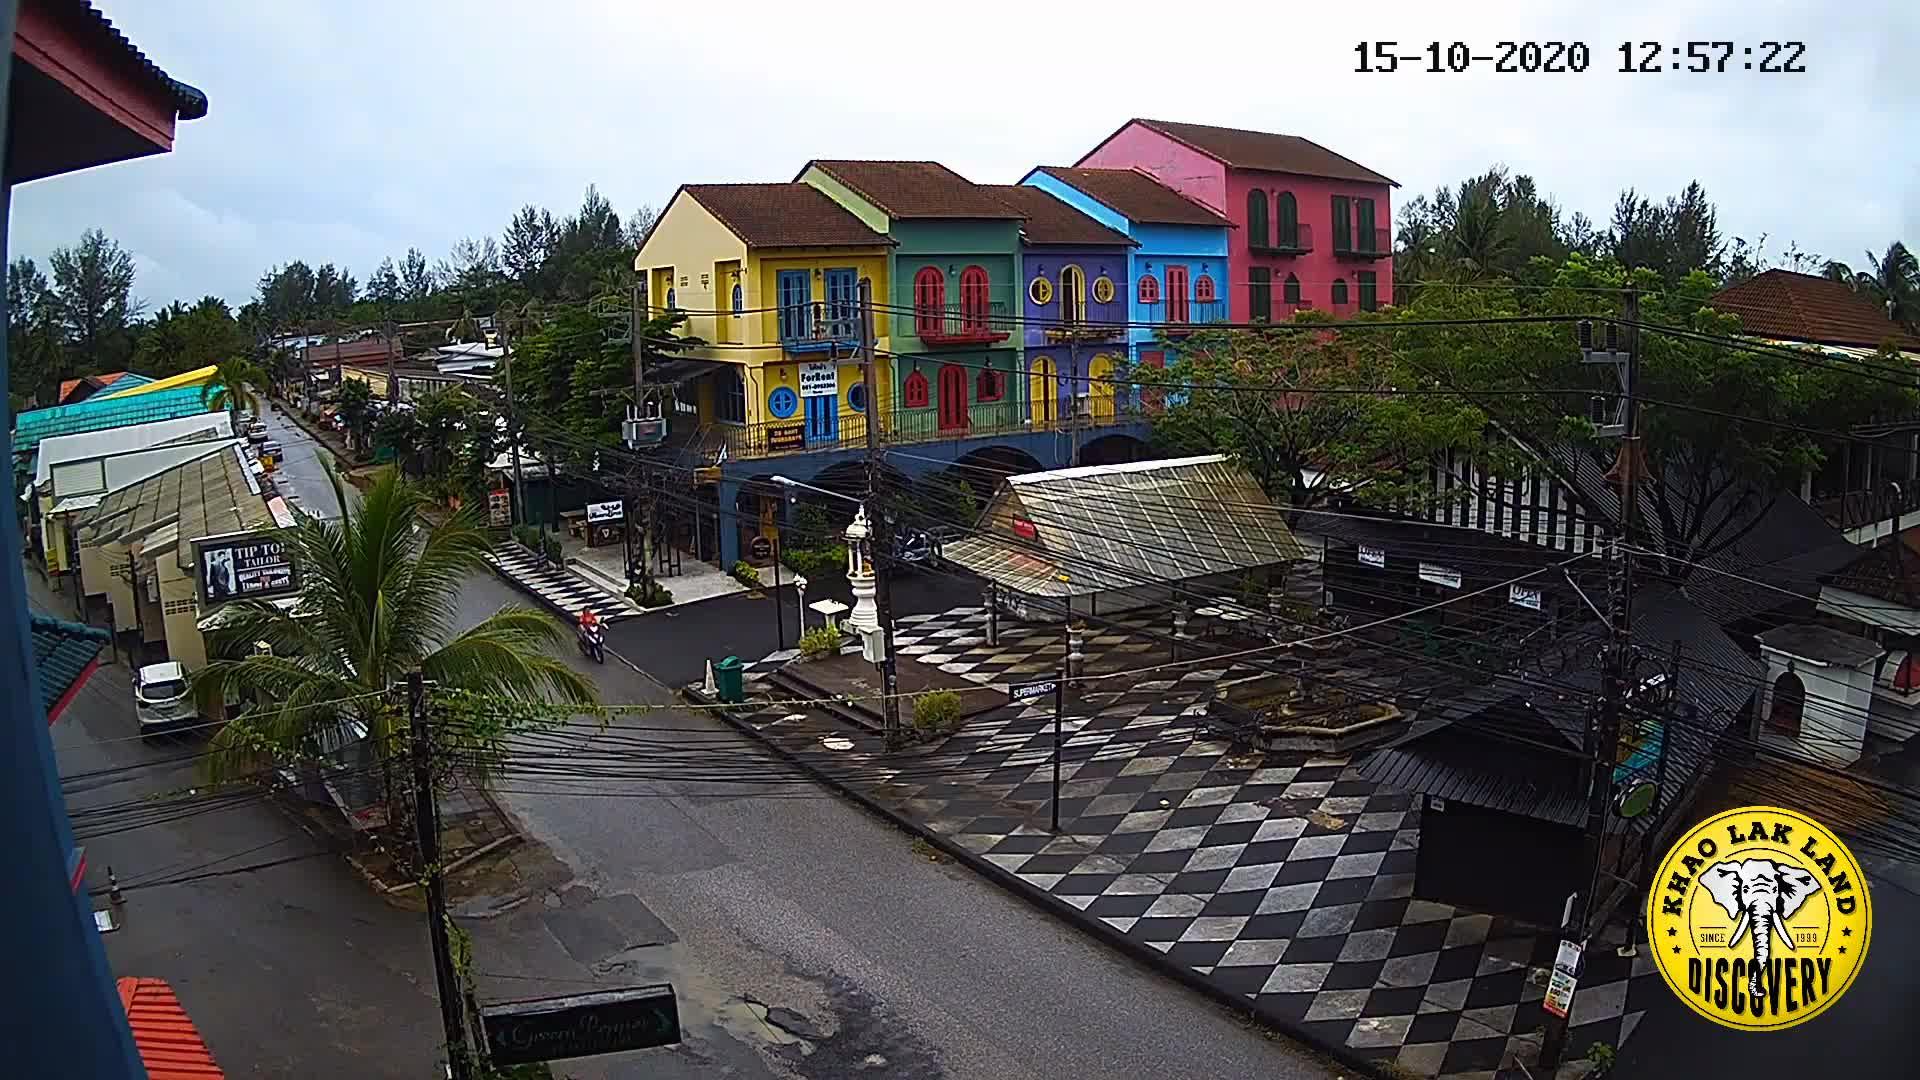 Gustavia Wed. 01:59